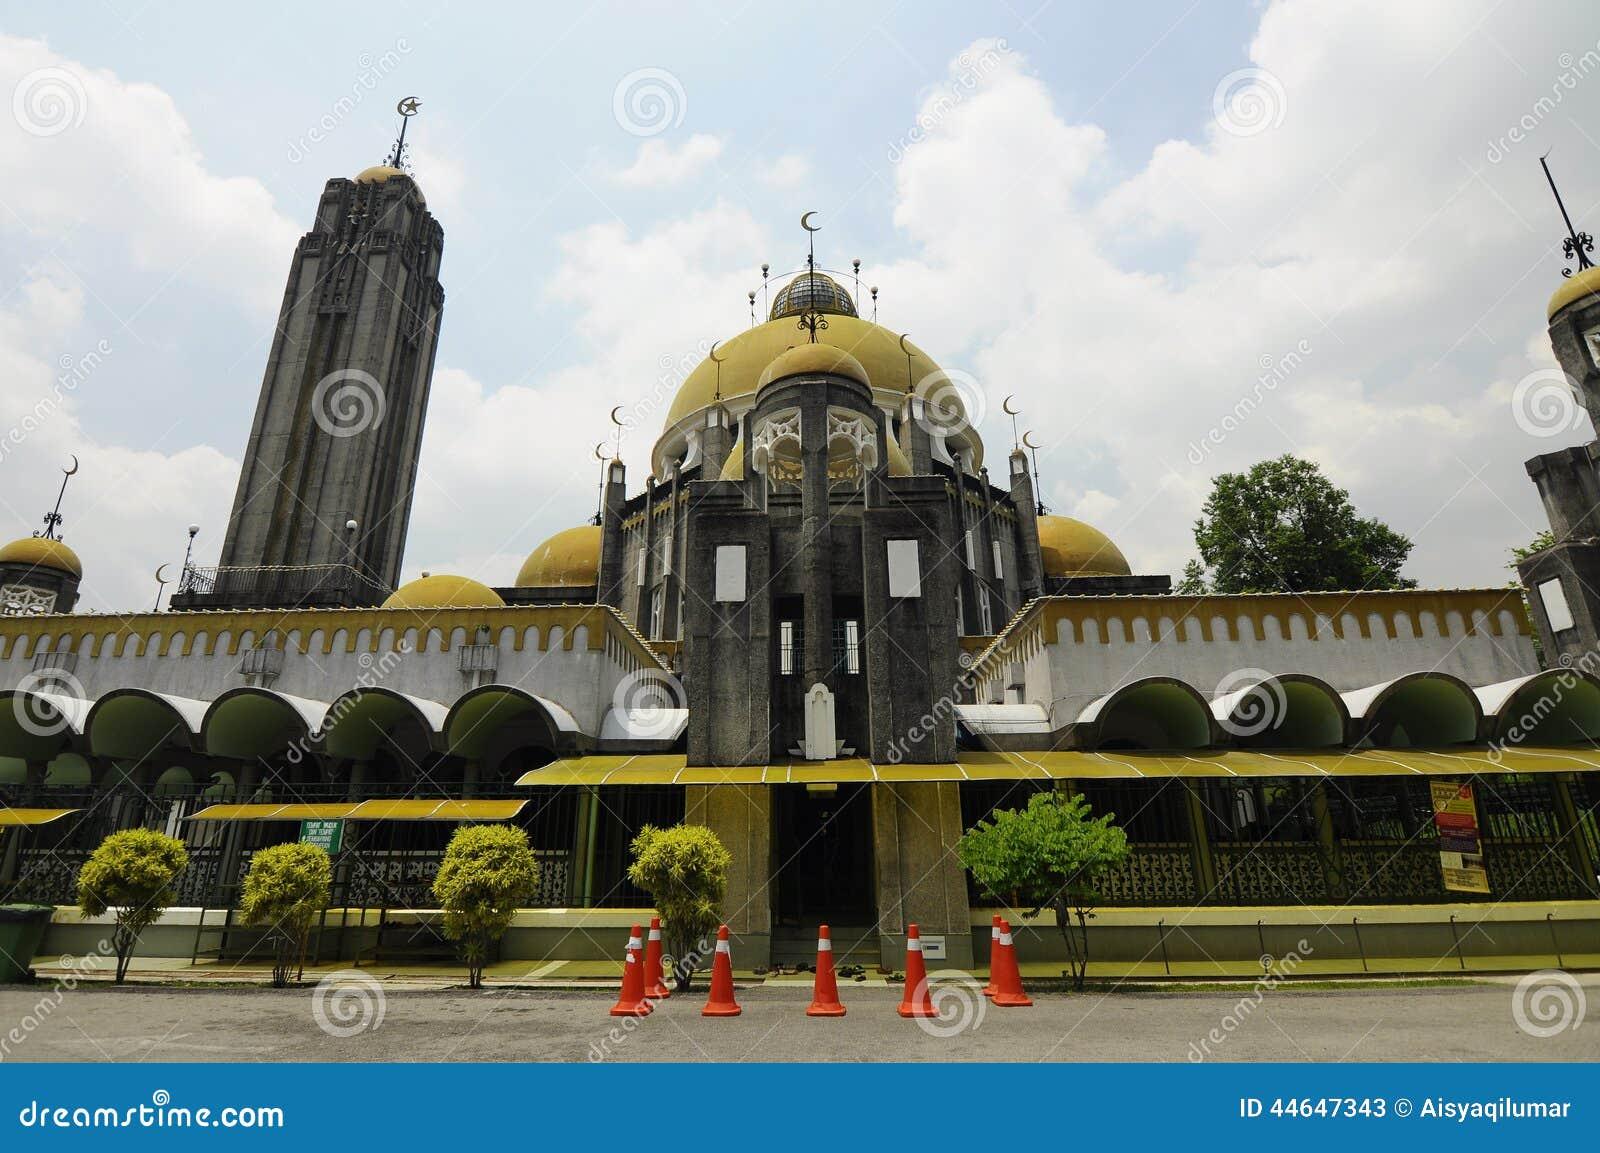 Selangor Malaysia  city images : ... selangor malaysia march also known as selangor s royal march selangor